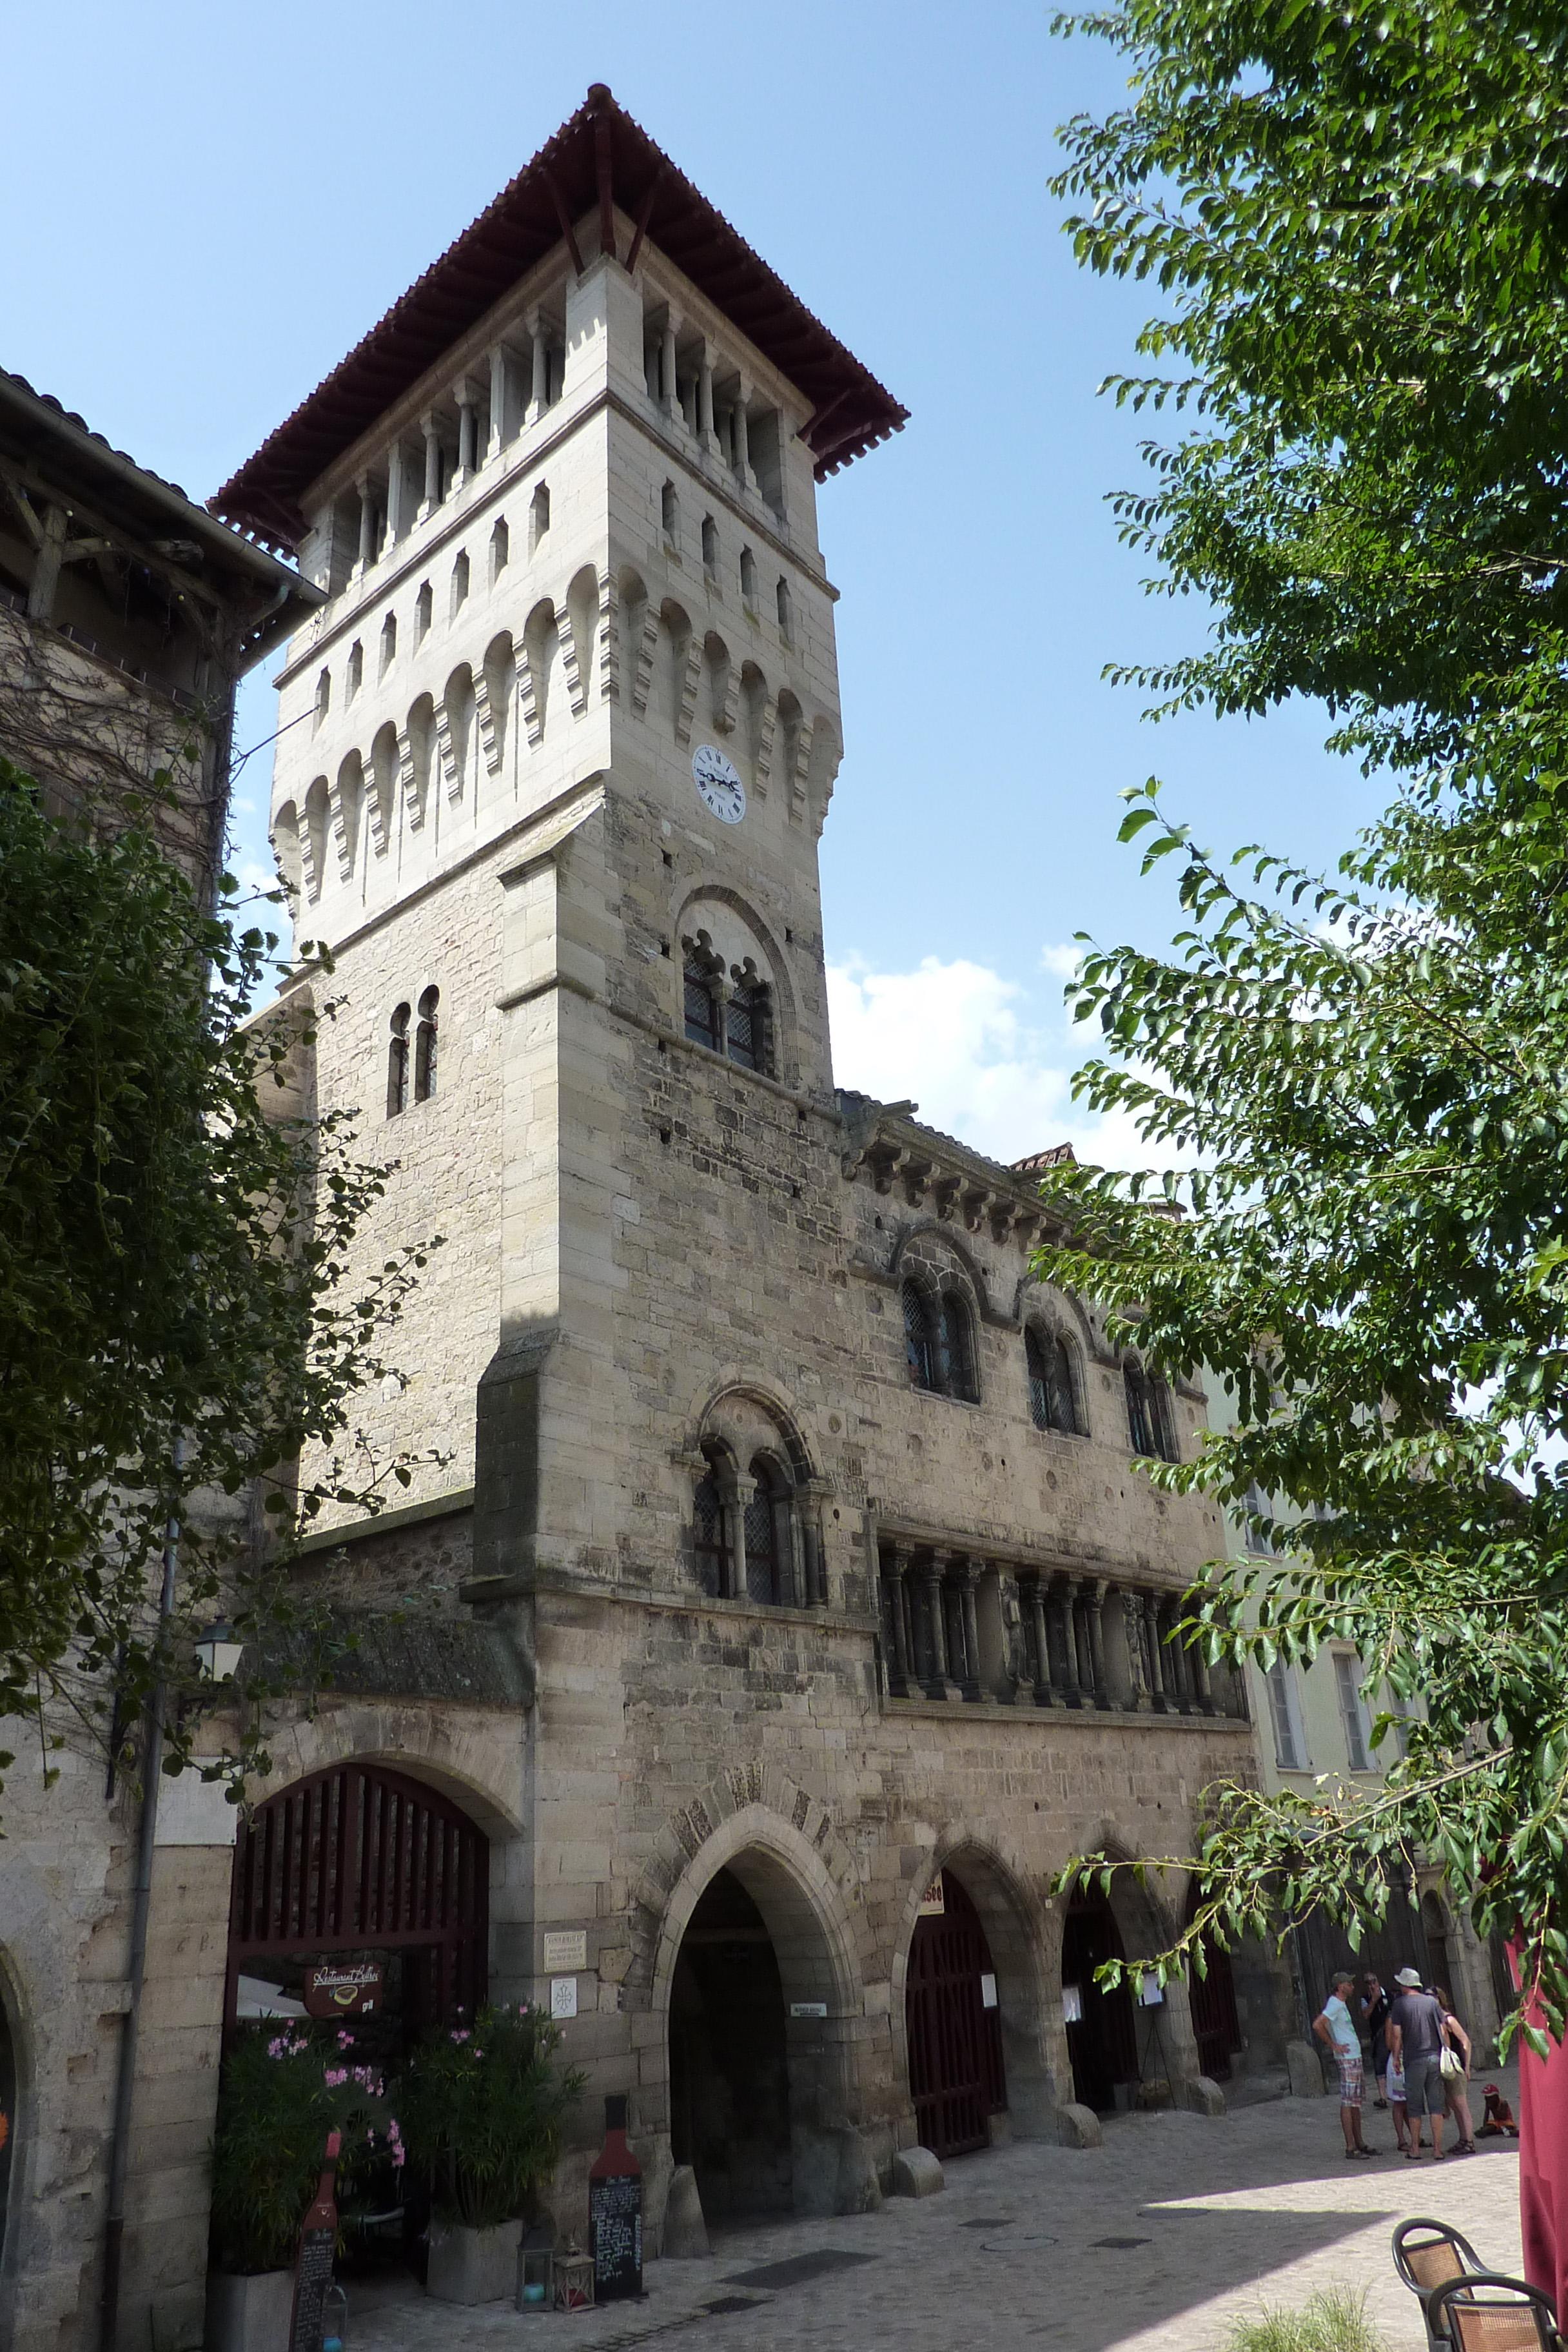 maison dite du roy (xiiie siècle) à saint-antonin-noble-val, tarn